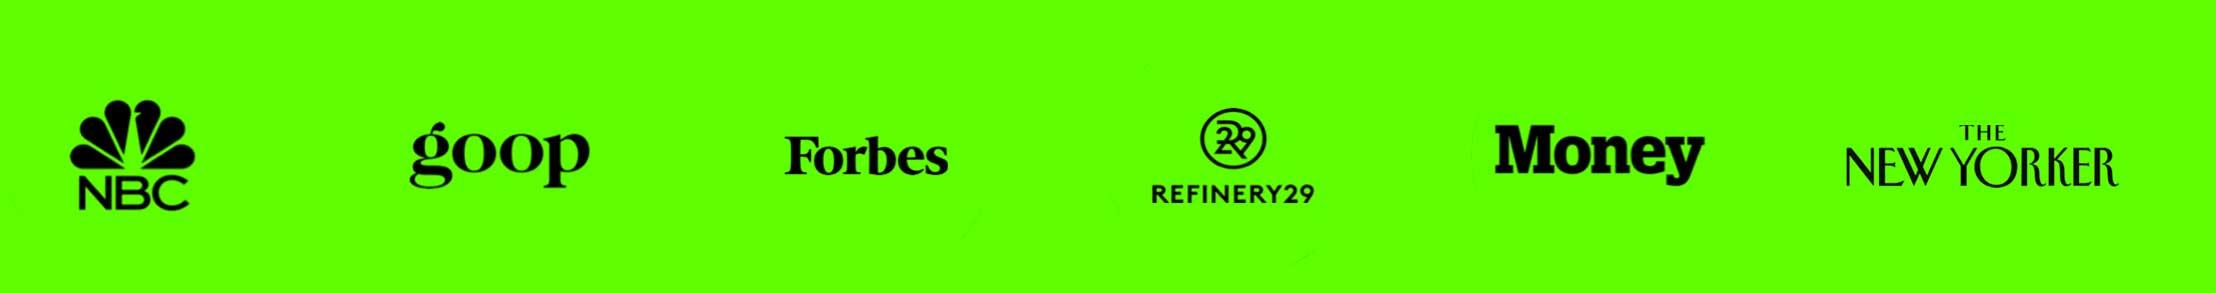 Logos_green.jpg